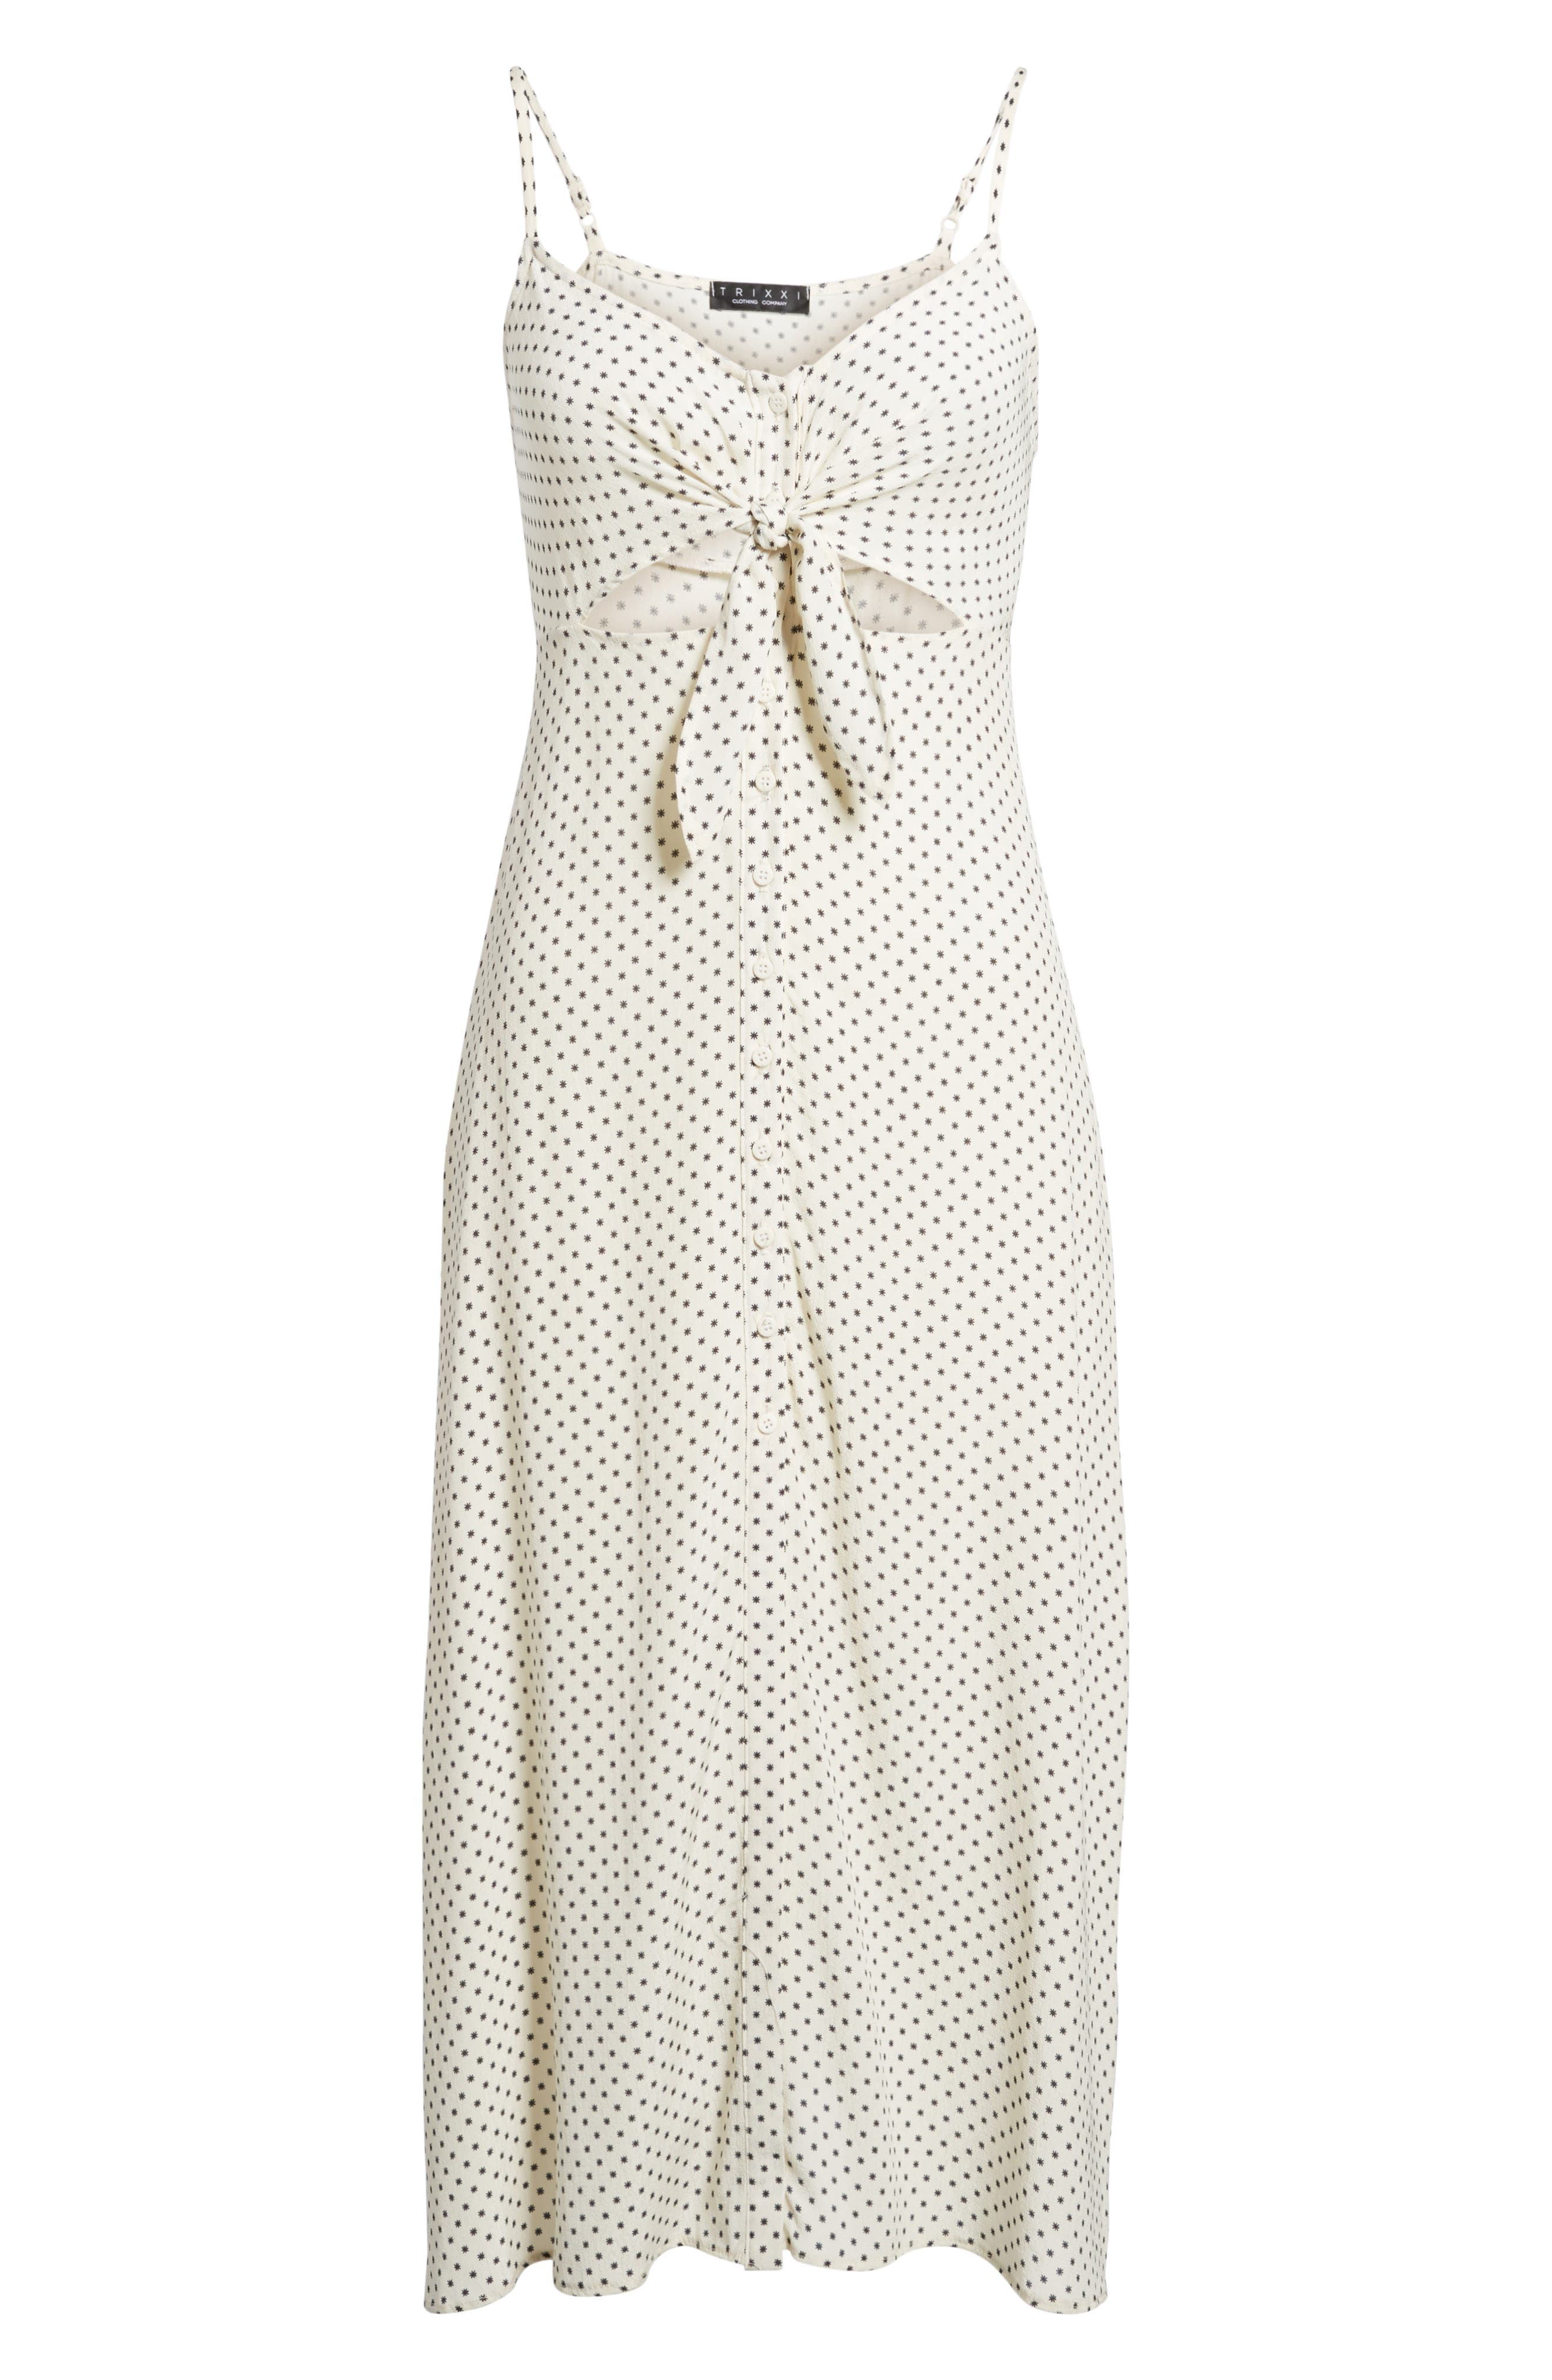 Tie Front Midi Dress,                             Alternate thumbnail 6, color,                             900